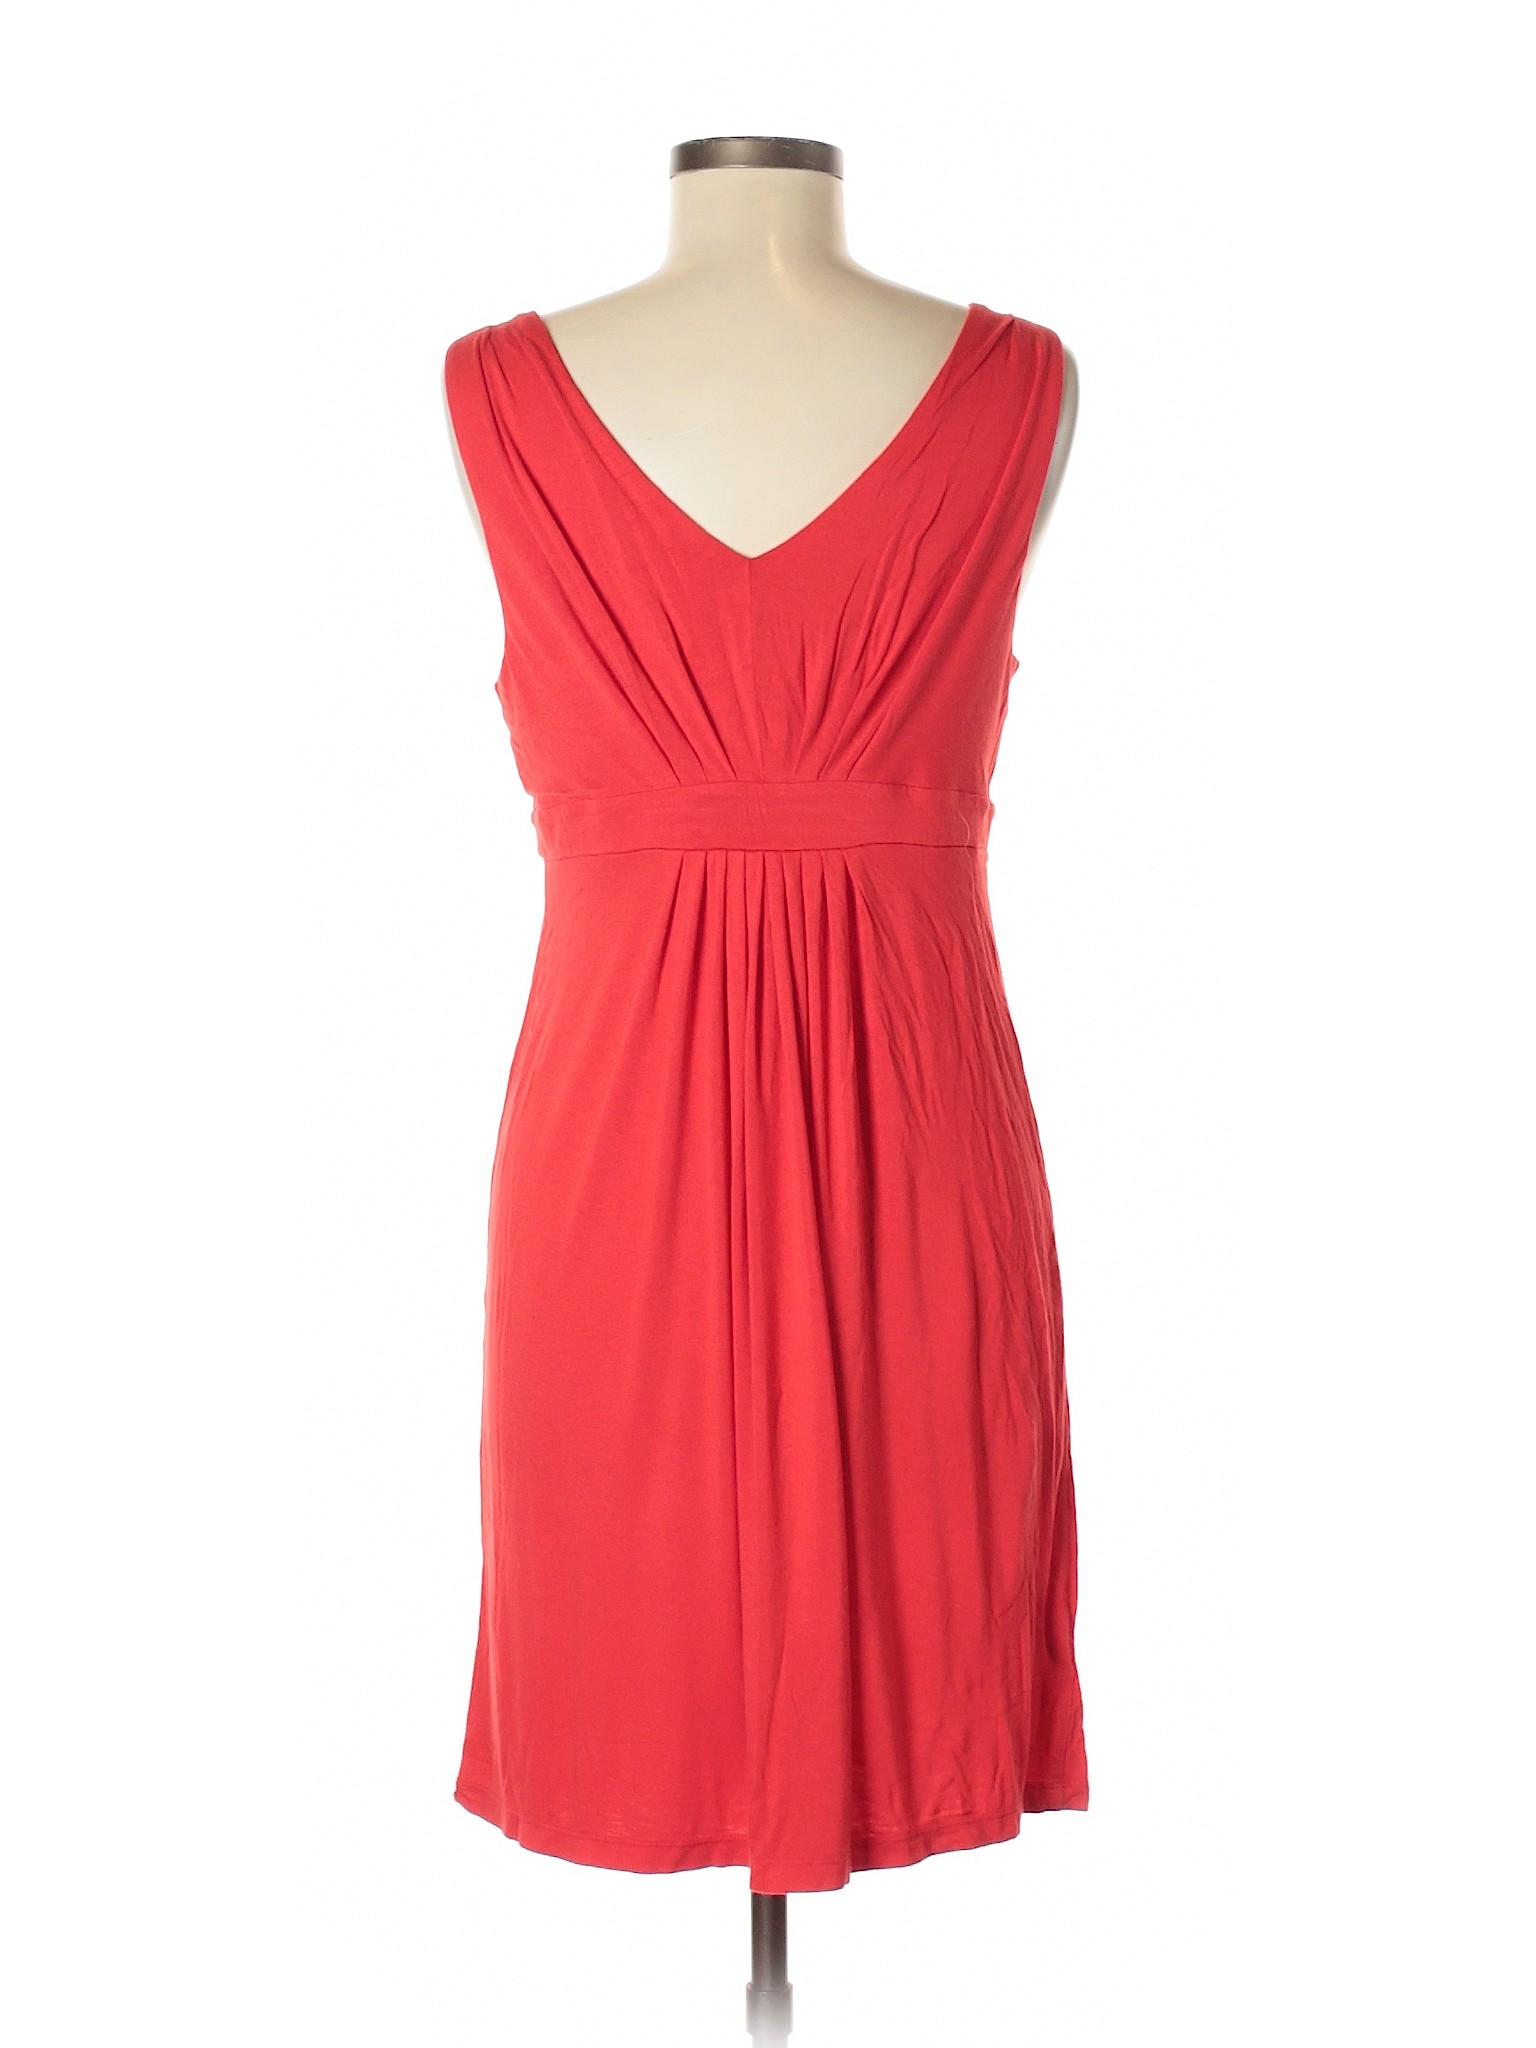 LOFT Boutique Dress Casual winter Ann Taylor pPP4Utq